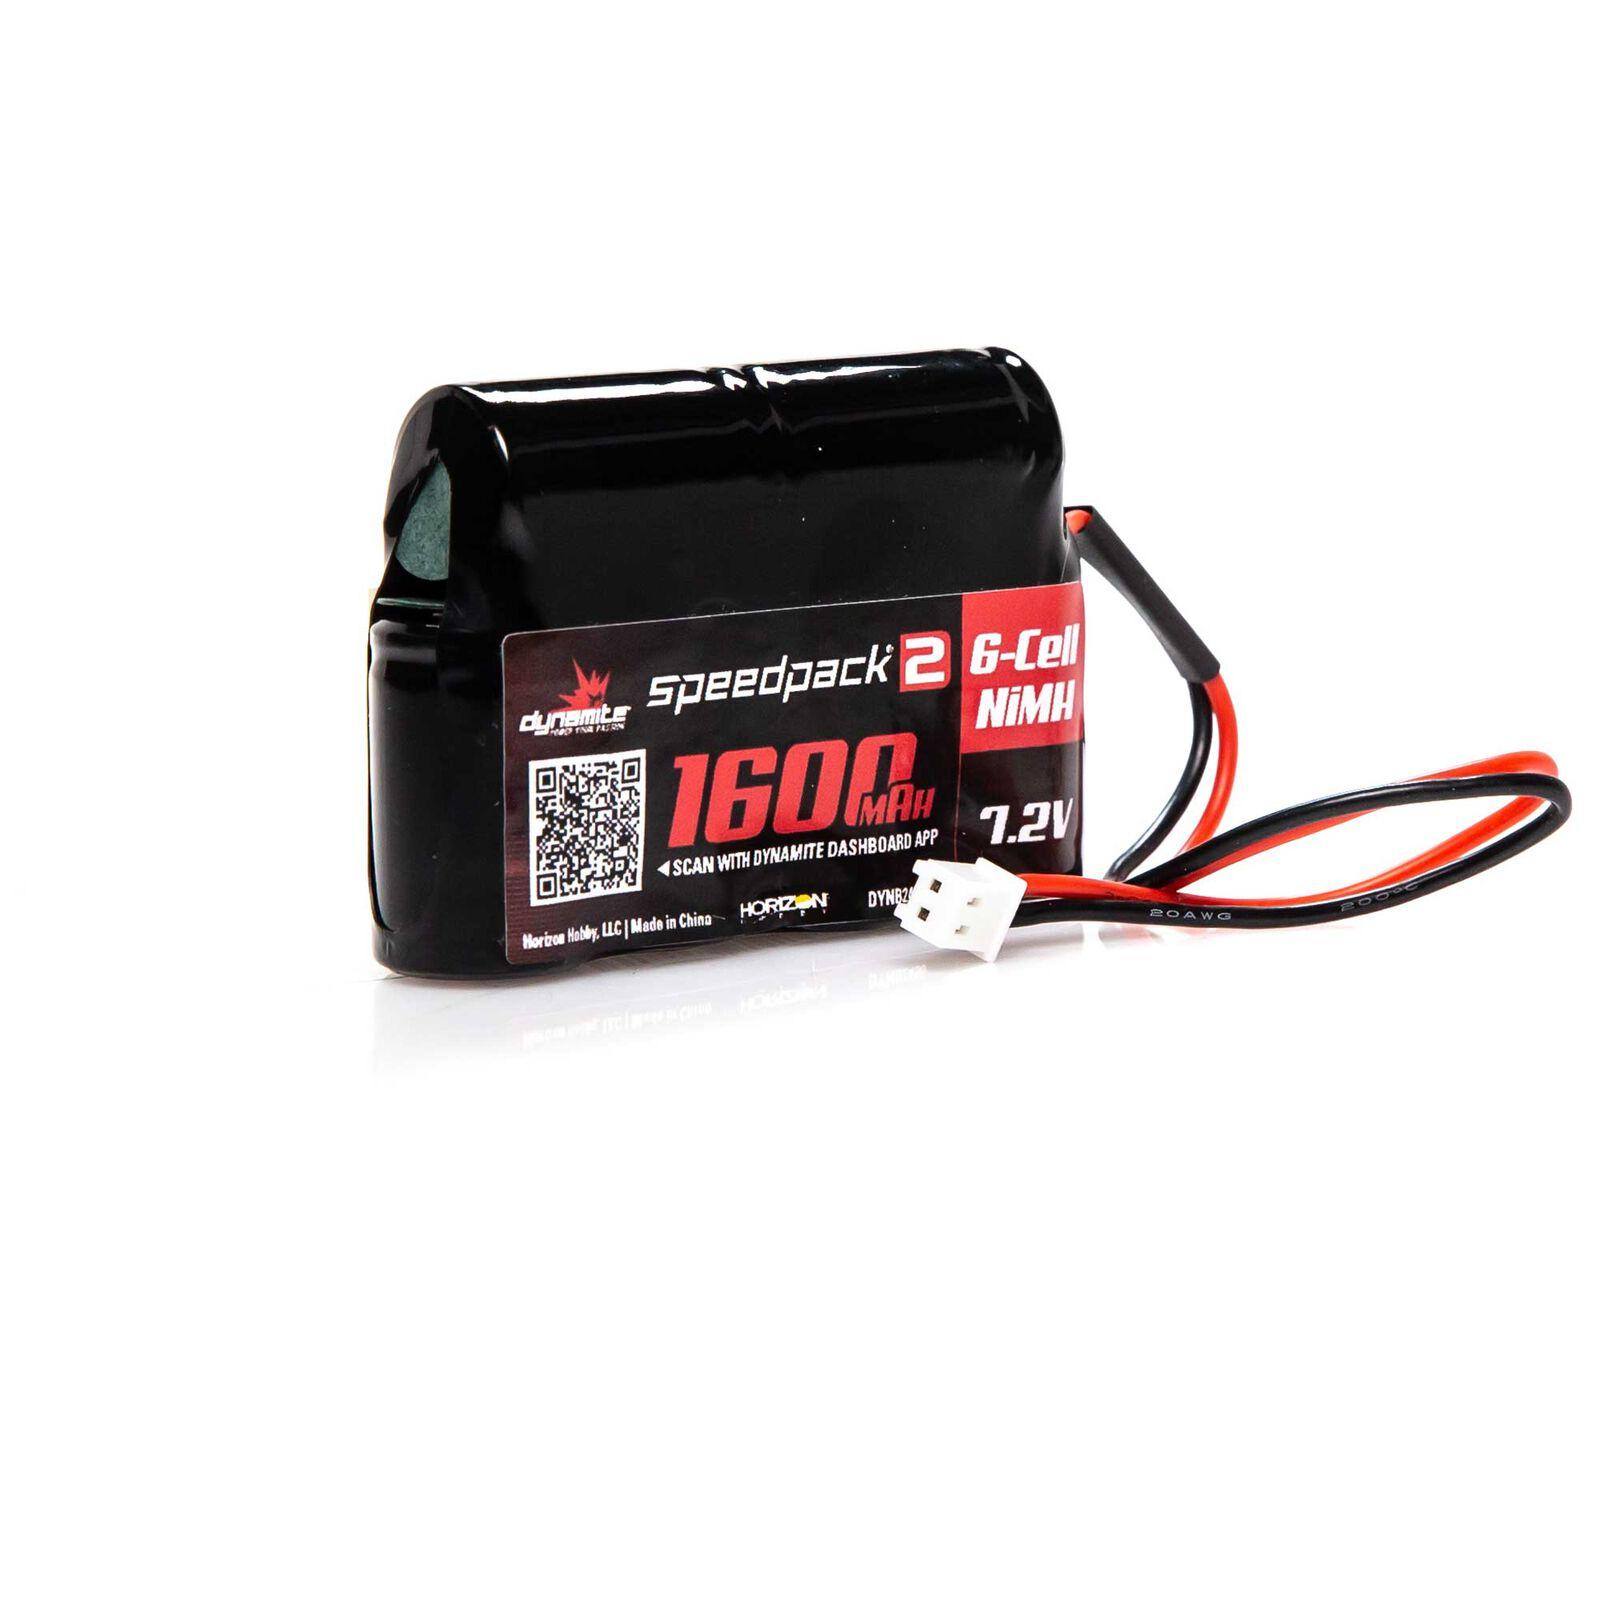 Speedpack2 7.2V 1600mAh 6C NiMH, MINI-T, MINI-LST2